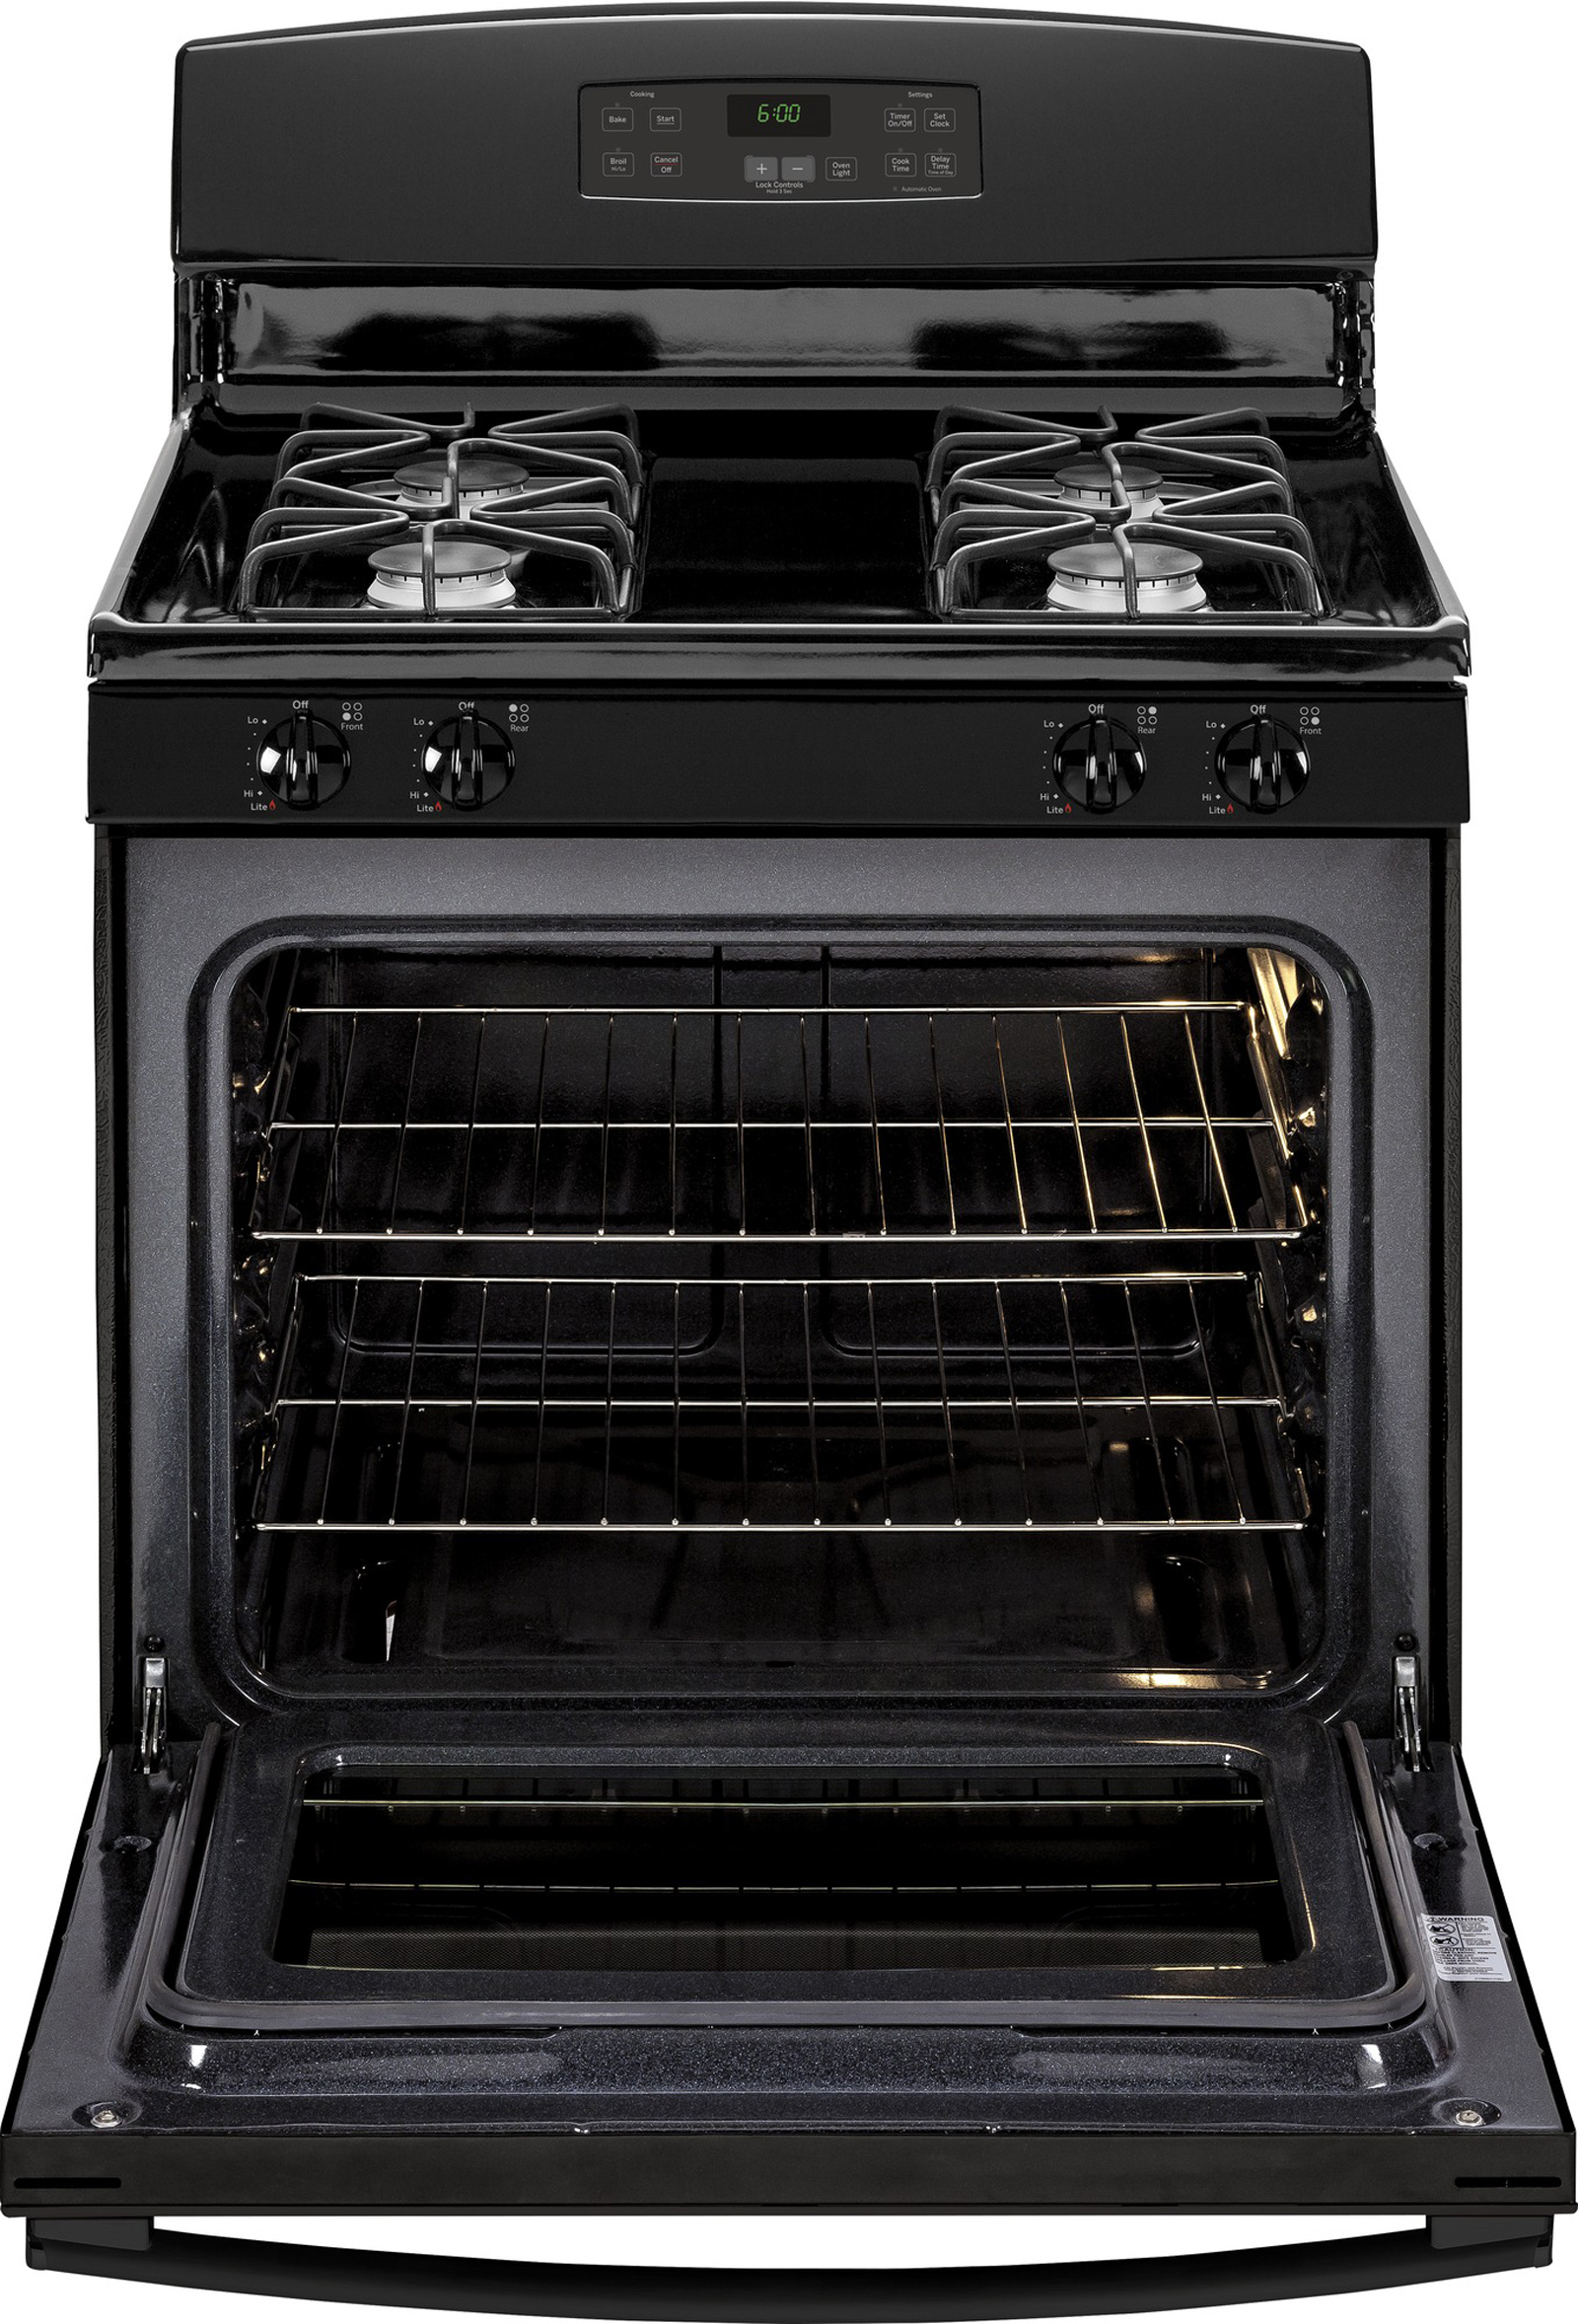 GE Appliances JGBS60DEFBB 4.8 cu. ft. Gas Range - Black